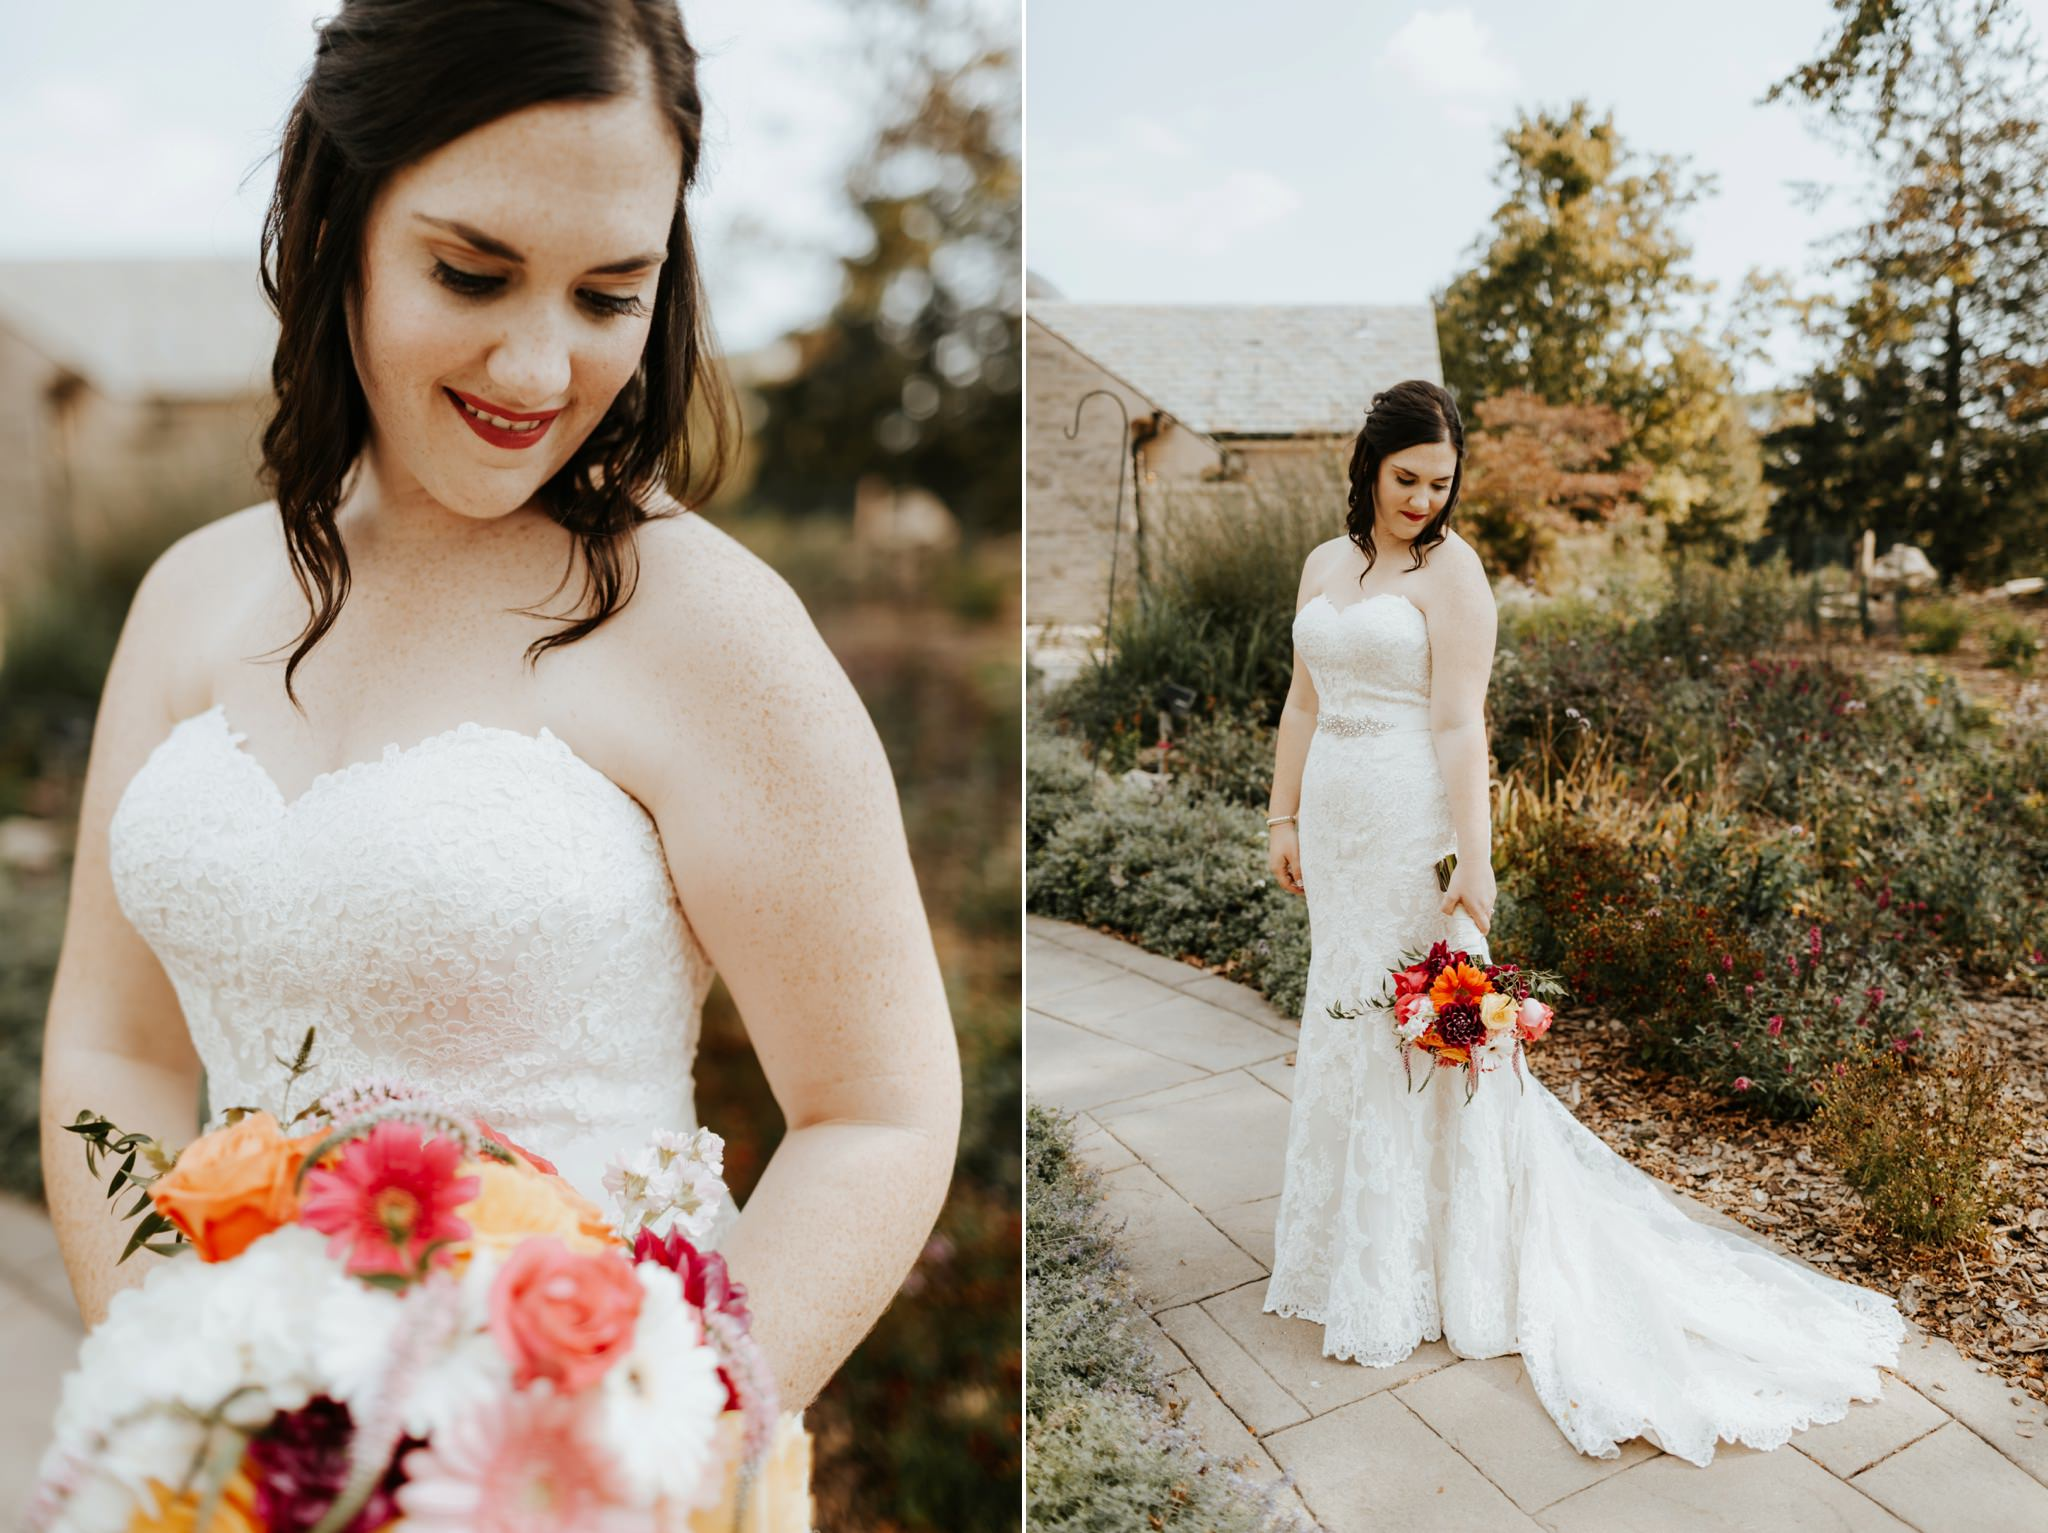 17-09-15 Lindsey and Brandon Wedding Edited-353_WEB.jpg